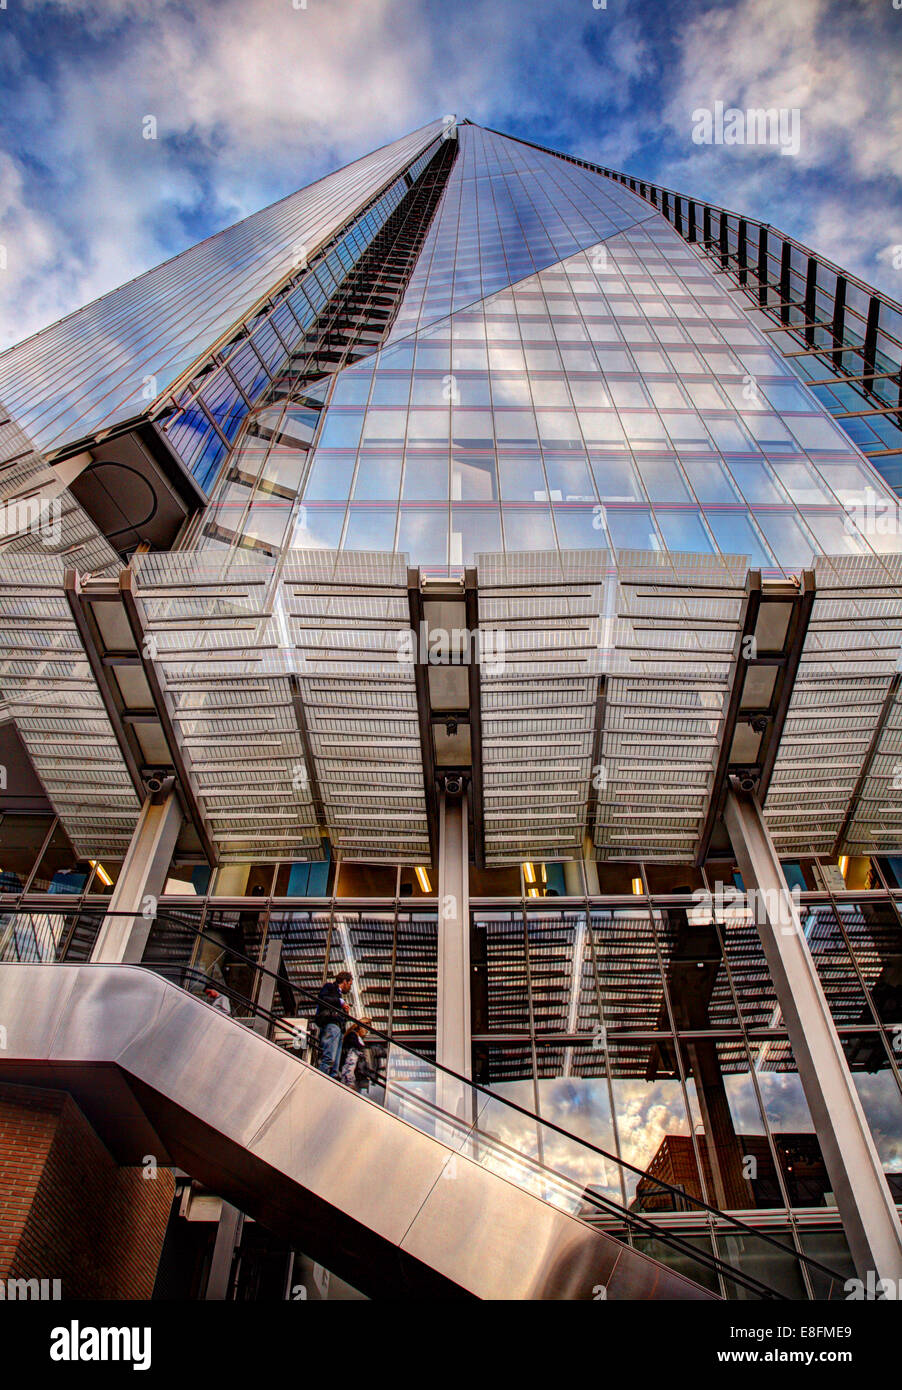 United Kingdom, London, Upward view of Shard of Glass - Stock Image